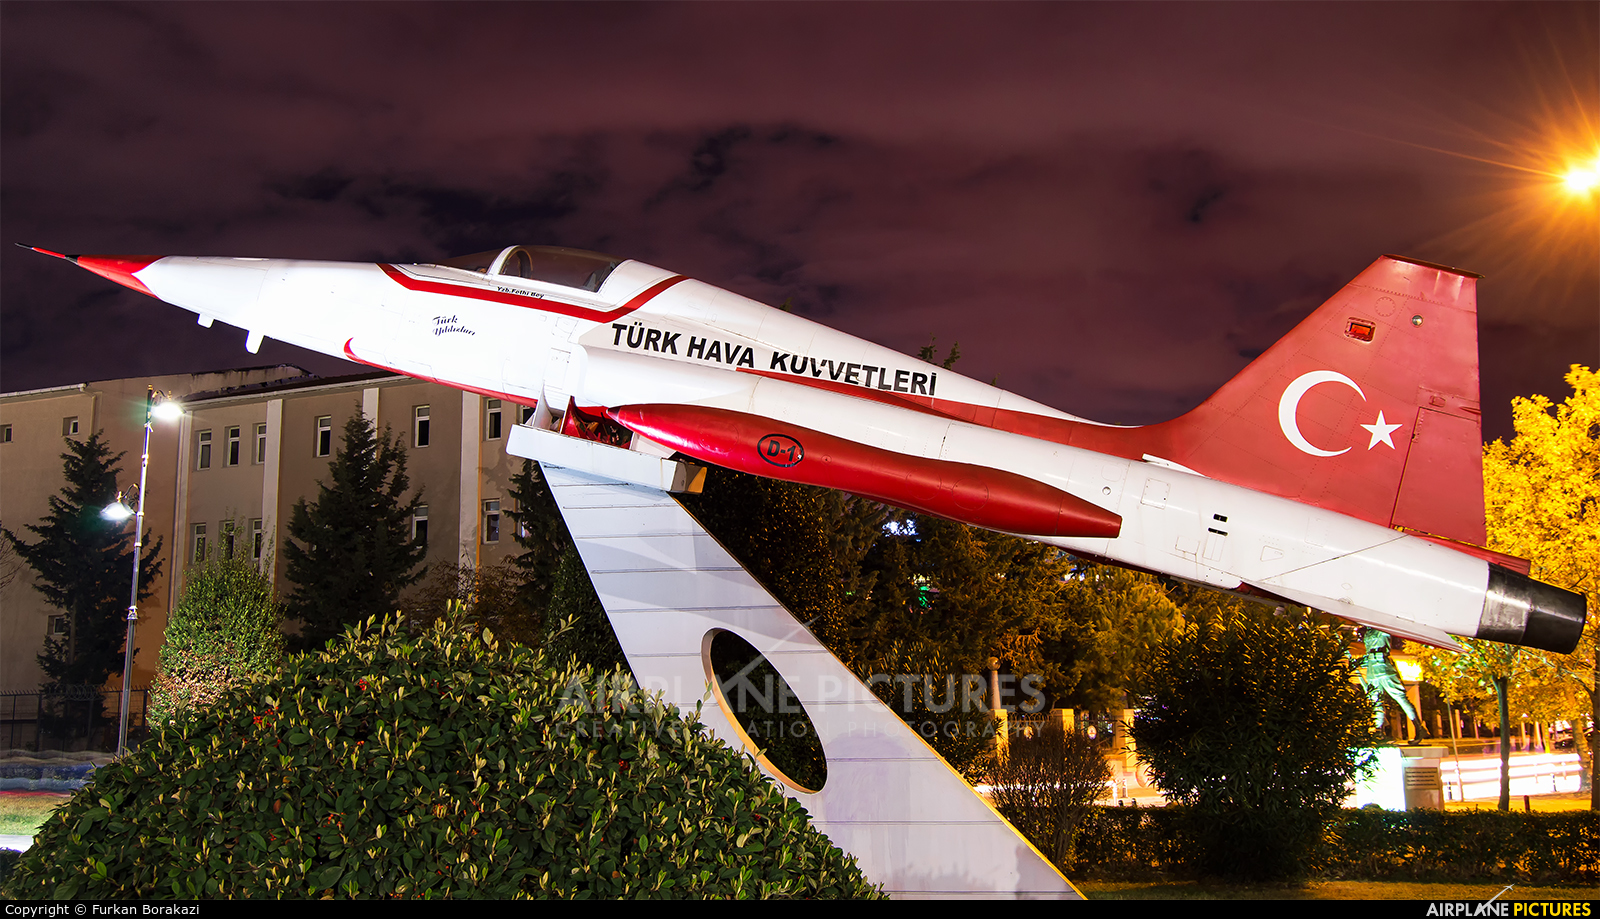 Turkey - Air Force : Turkish Stars 69-7125 aircraft at Off Airport - Turkey